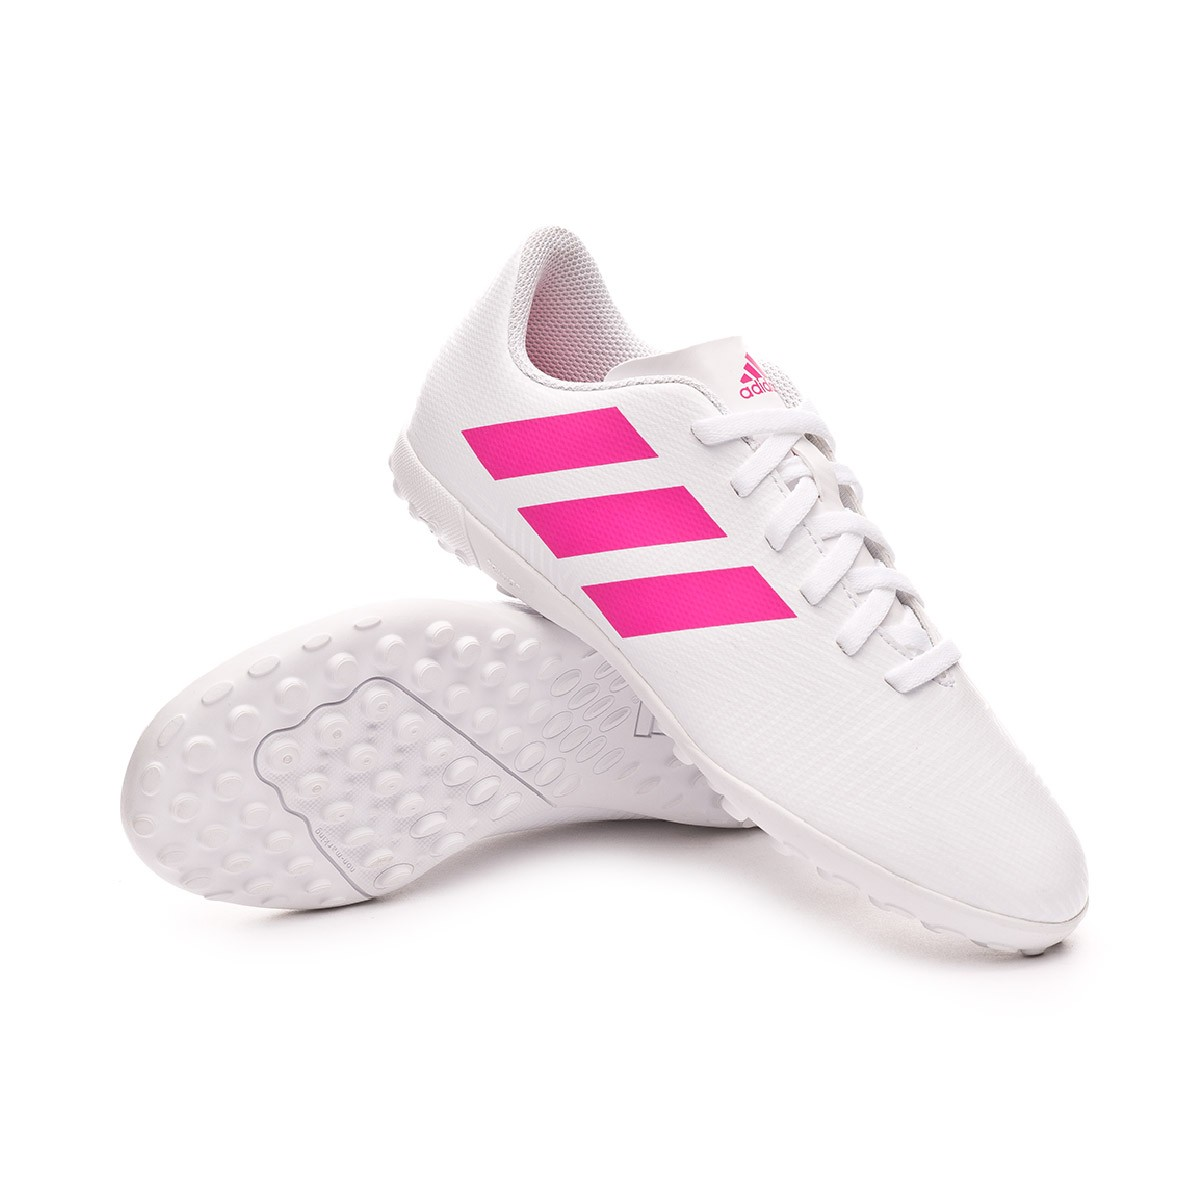 Scarpe adidas Nemeziz Messi Tango 18.4 Turf Junior White